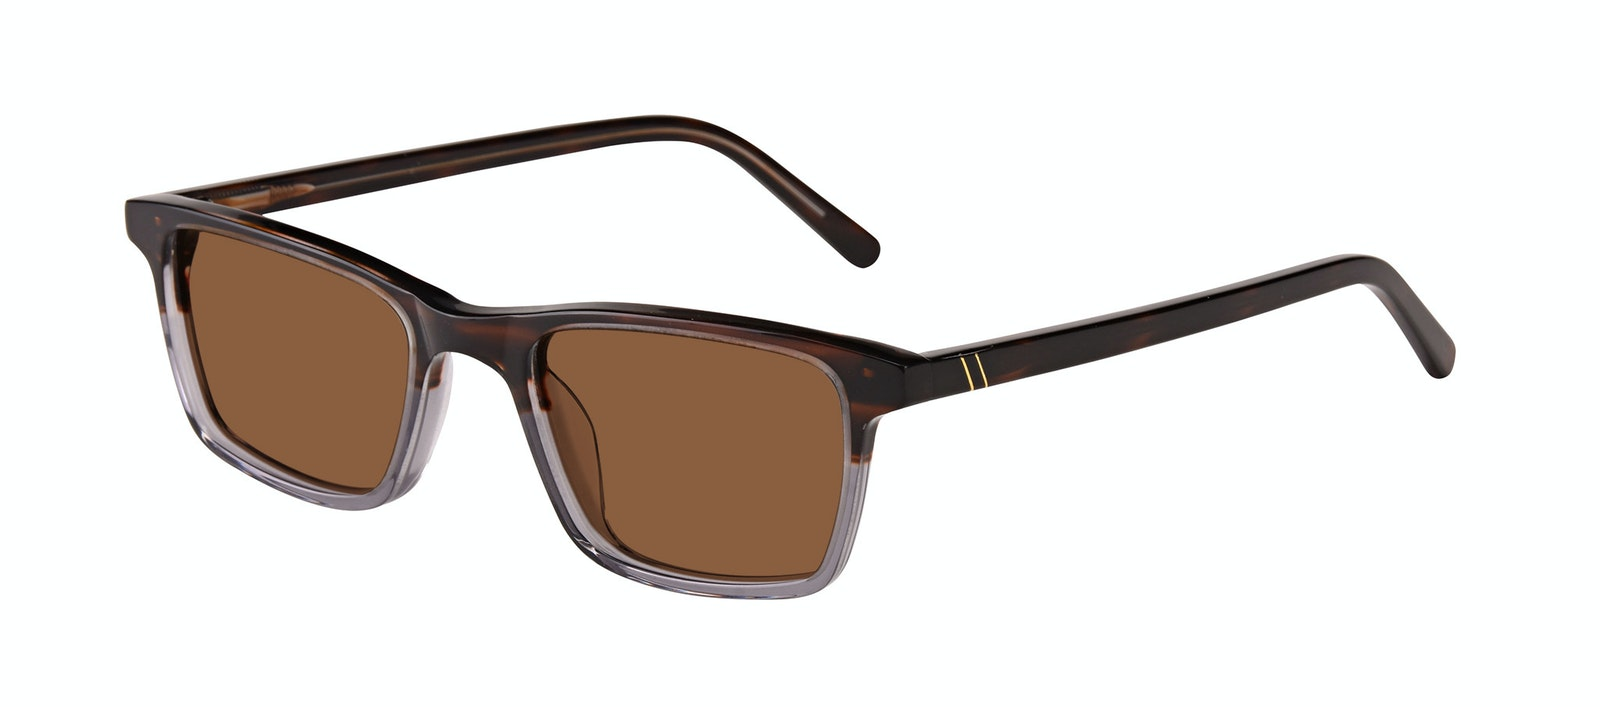 Affordable Fashion Glasses Rectangle Sunglasses Men Henri SML Storm Tilt